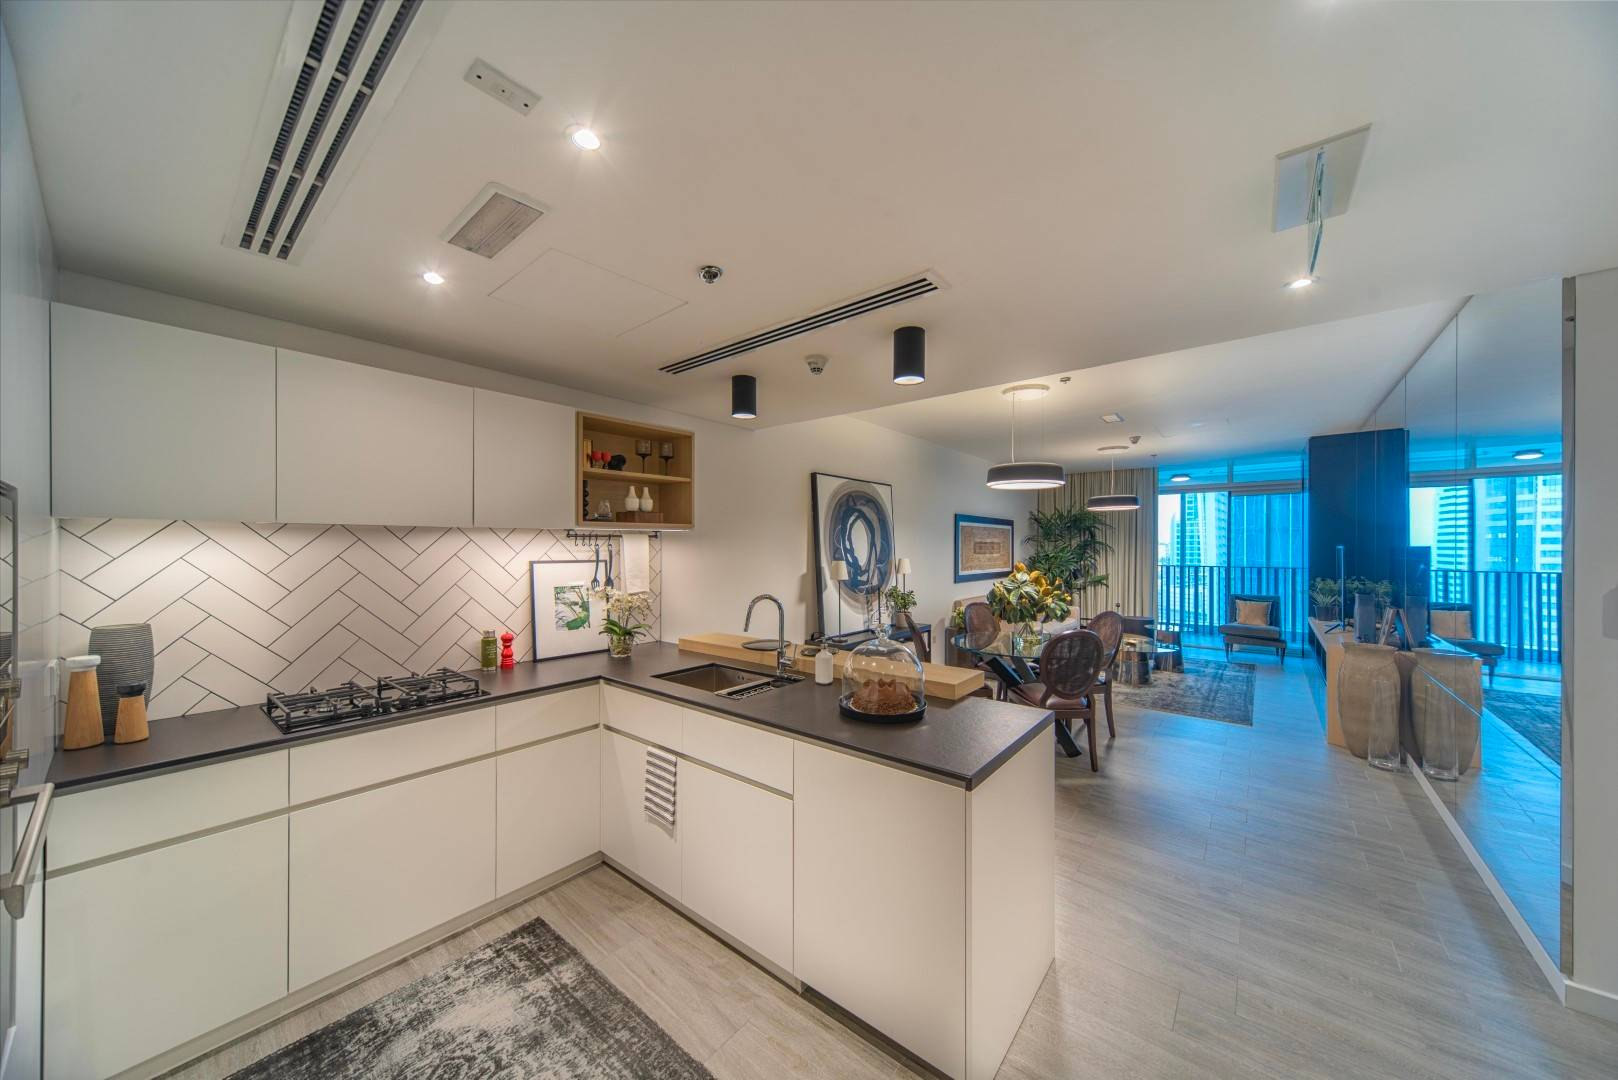 Апартаменты, sale в Belgravia Square Дубай, ОАЭ